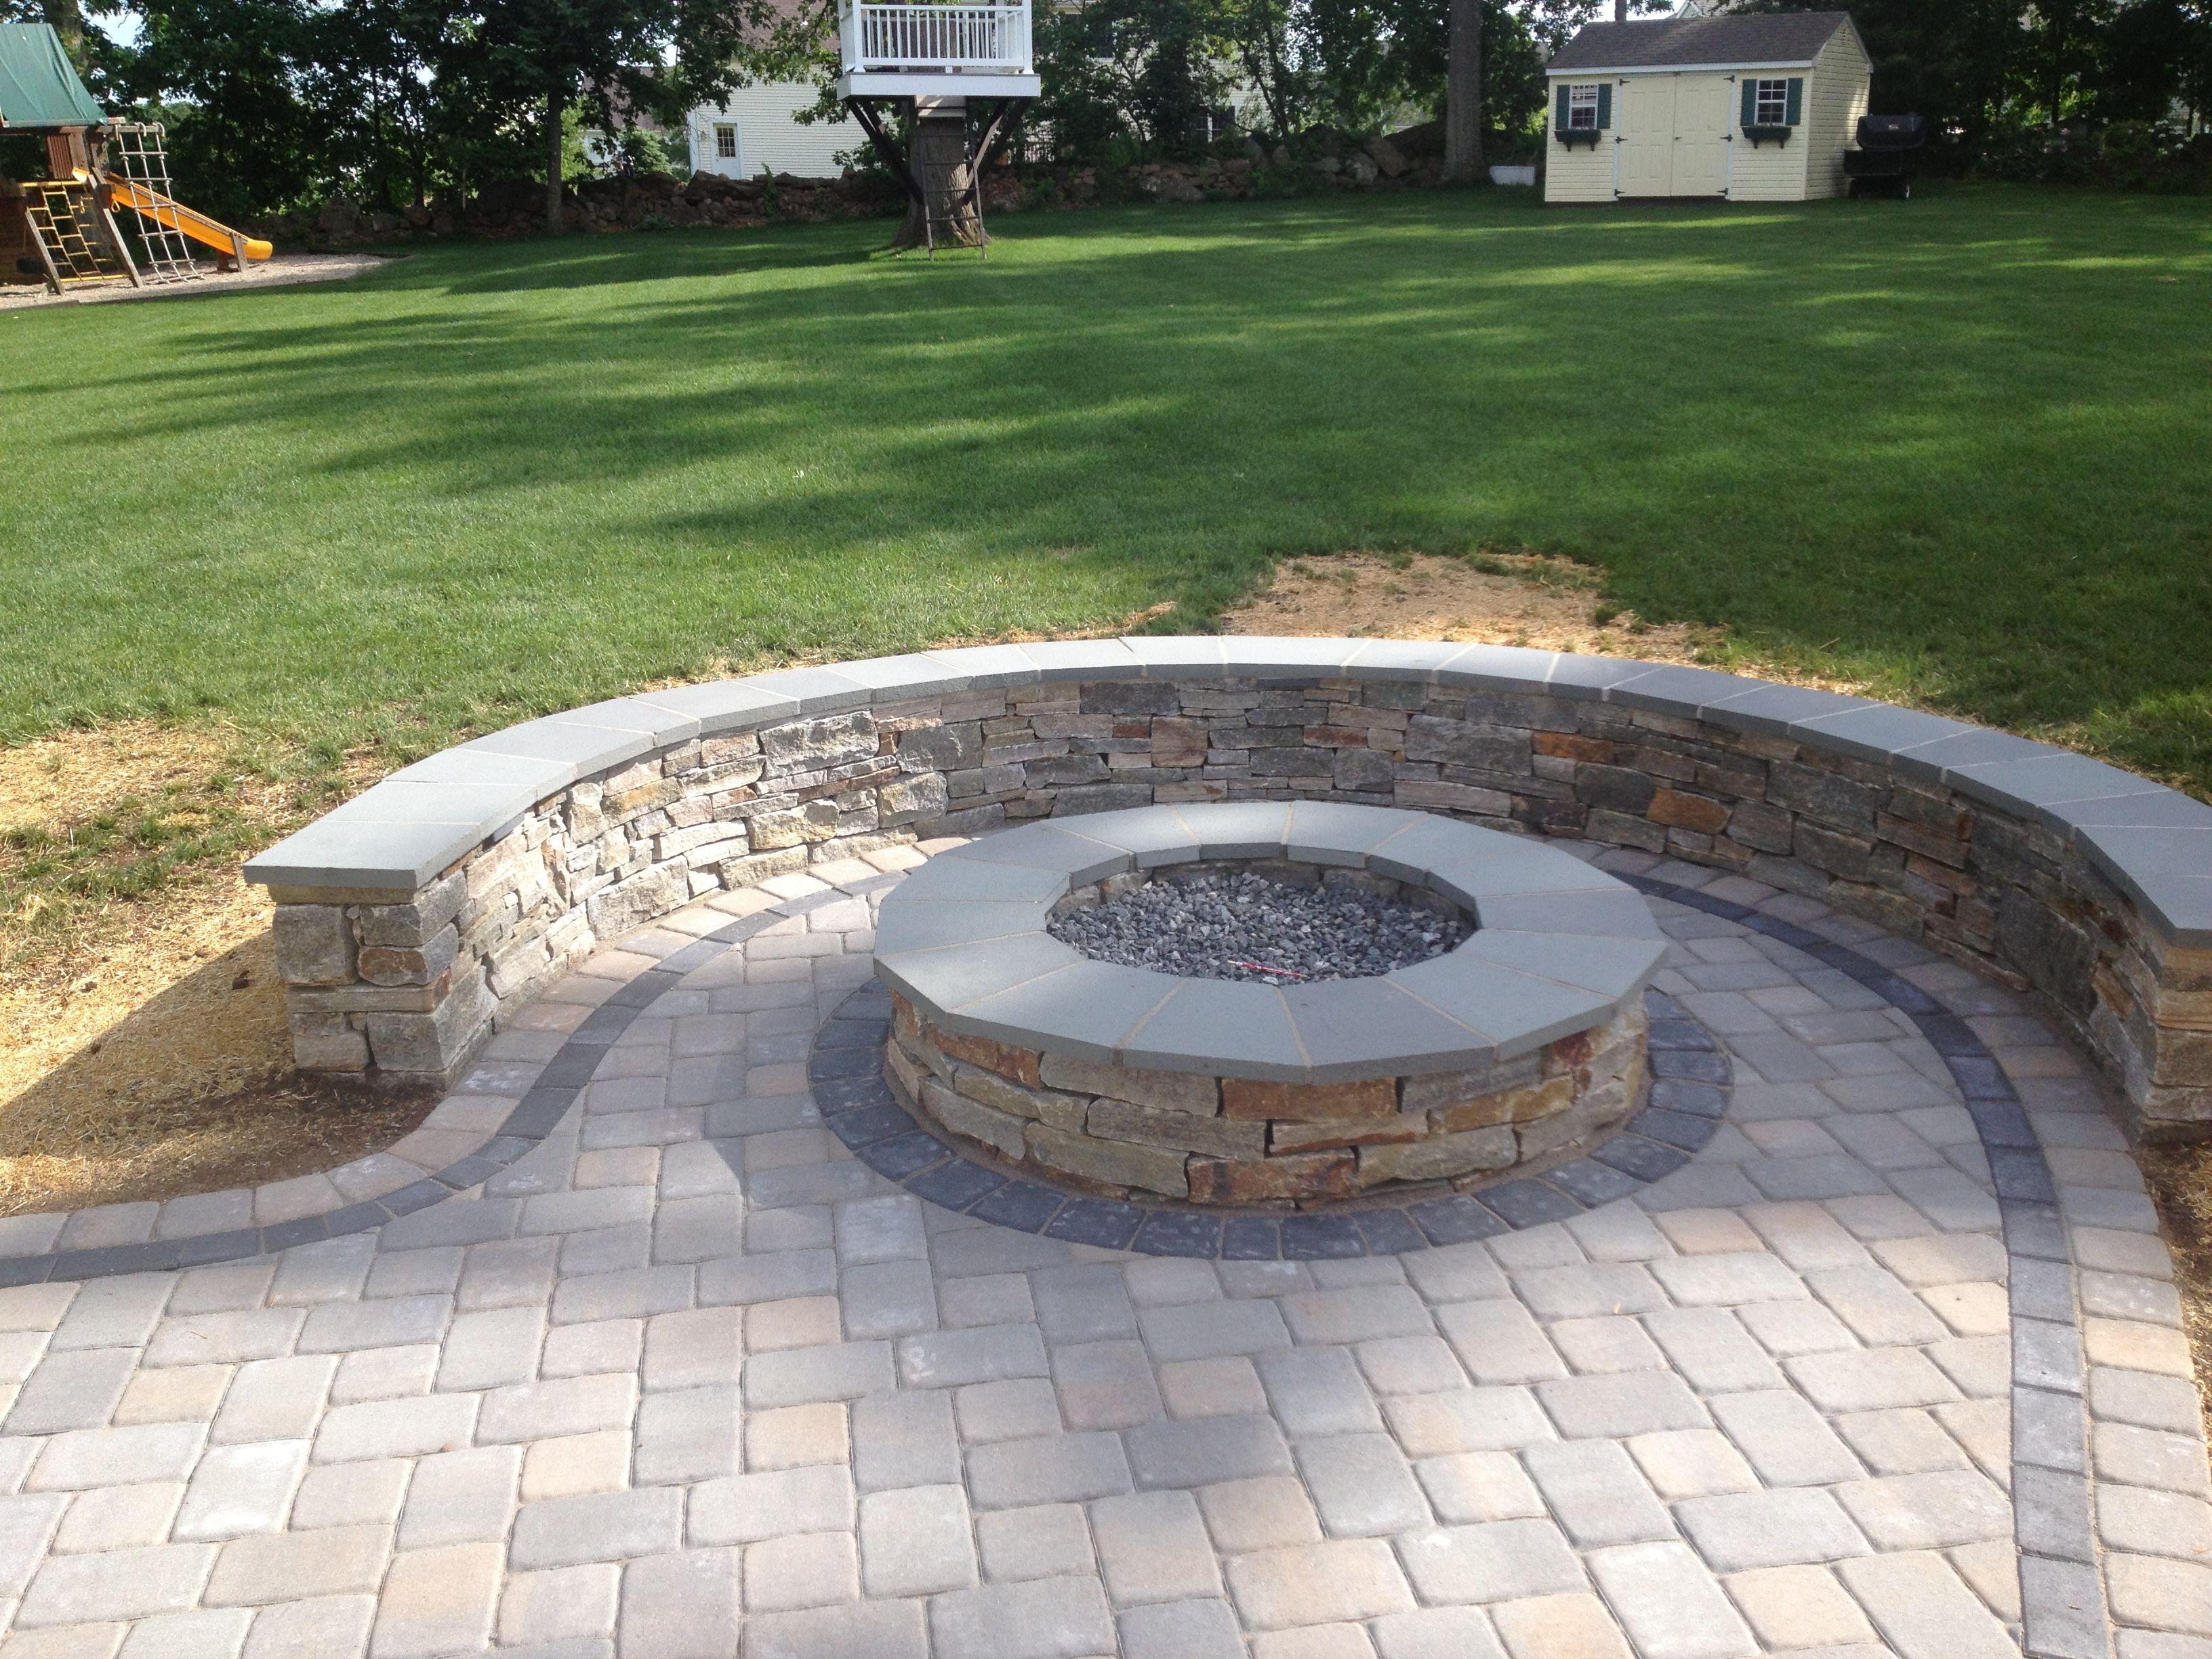 Paver Patio Ideas 86 | Stone patio designs, Brick patterns ... on Paver Patio With Fire Pit Ideas id=65439